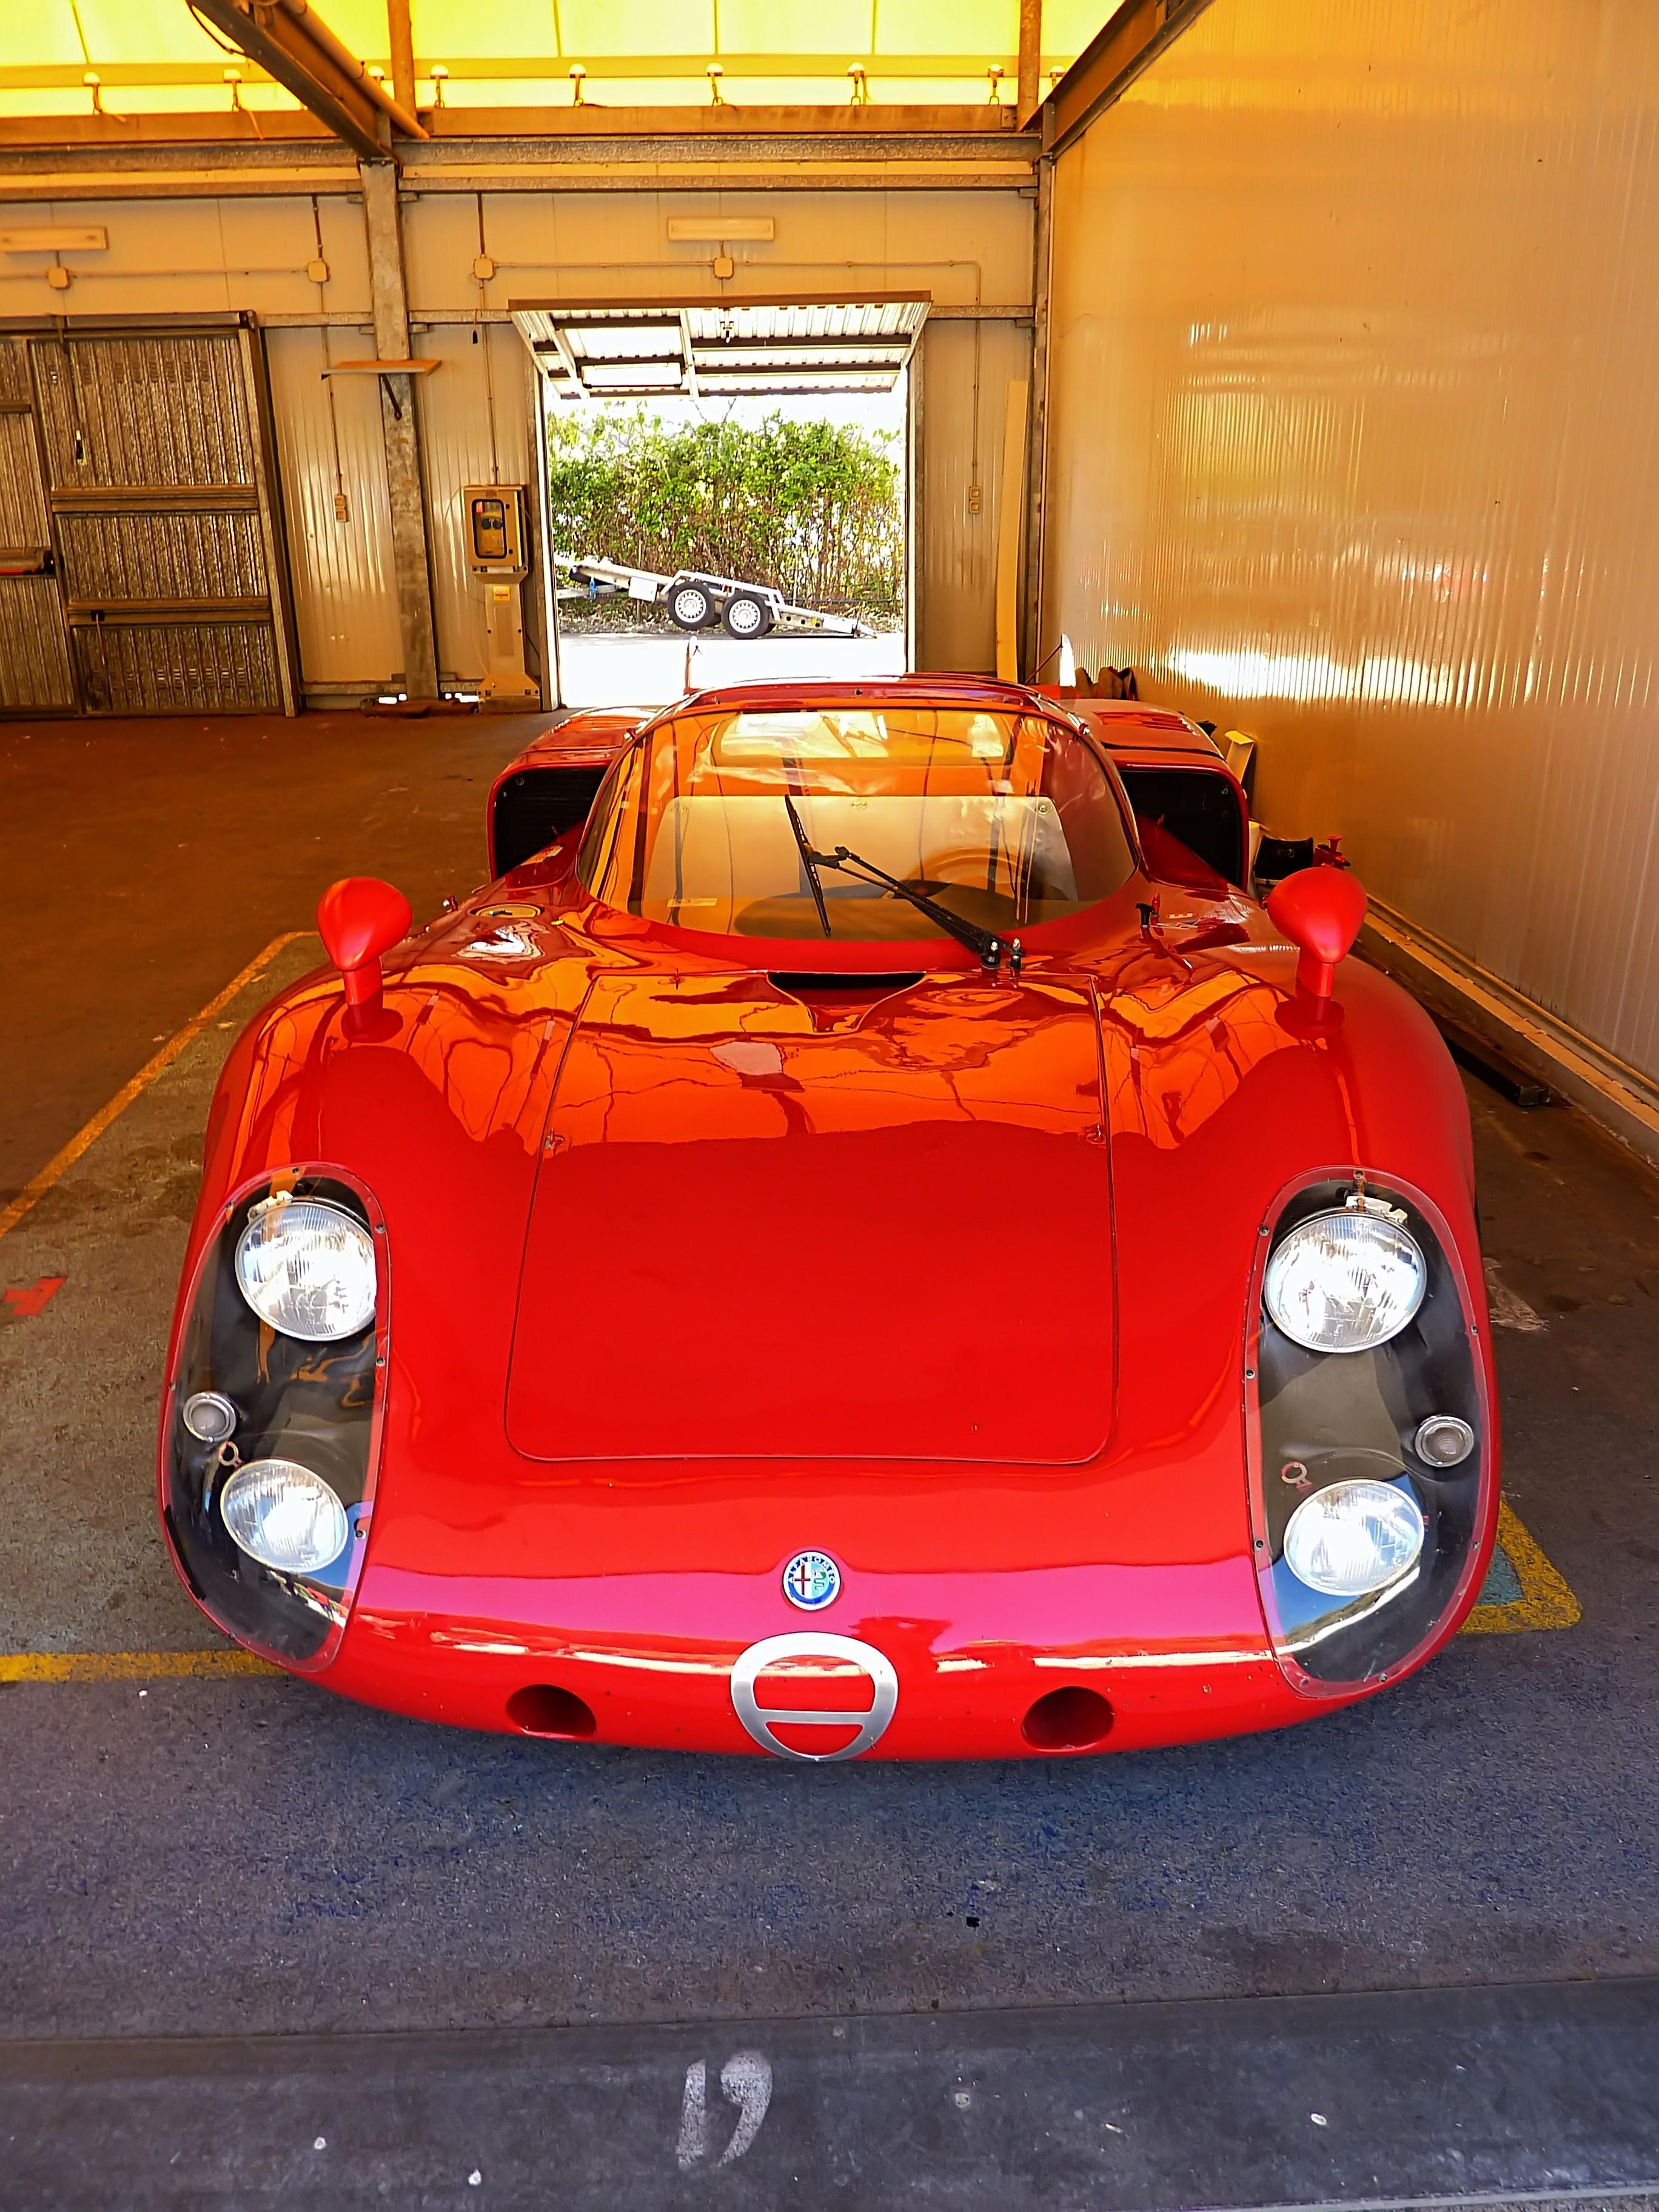 1968 Alfa Romeo T33-2 LeMans(Coda Lunga) (5)